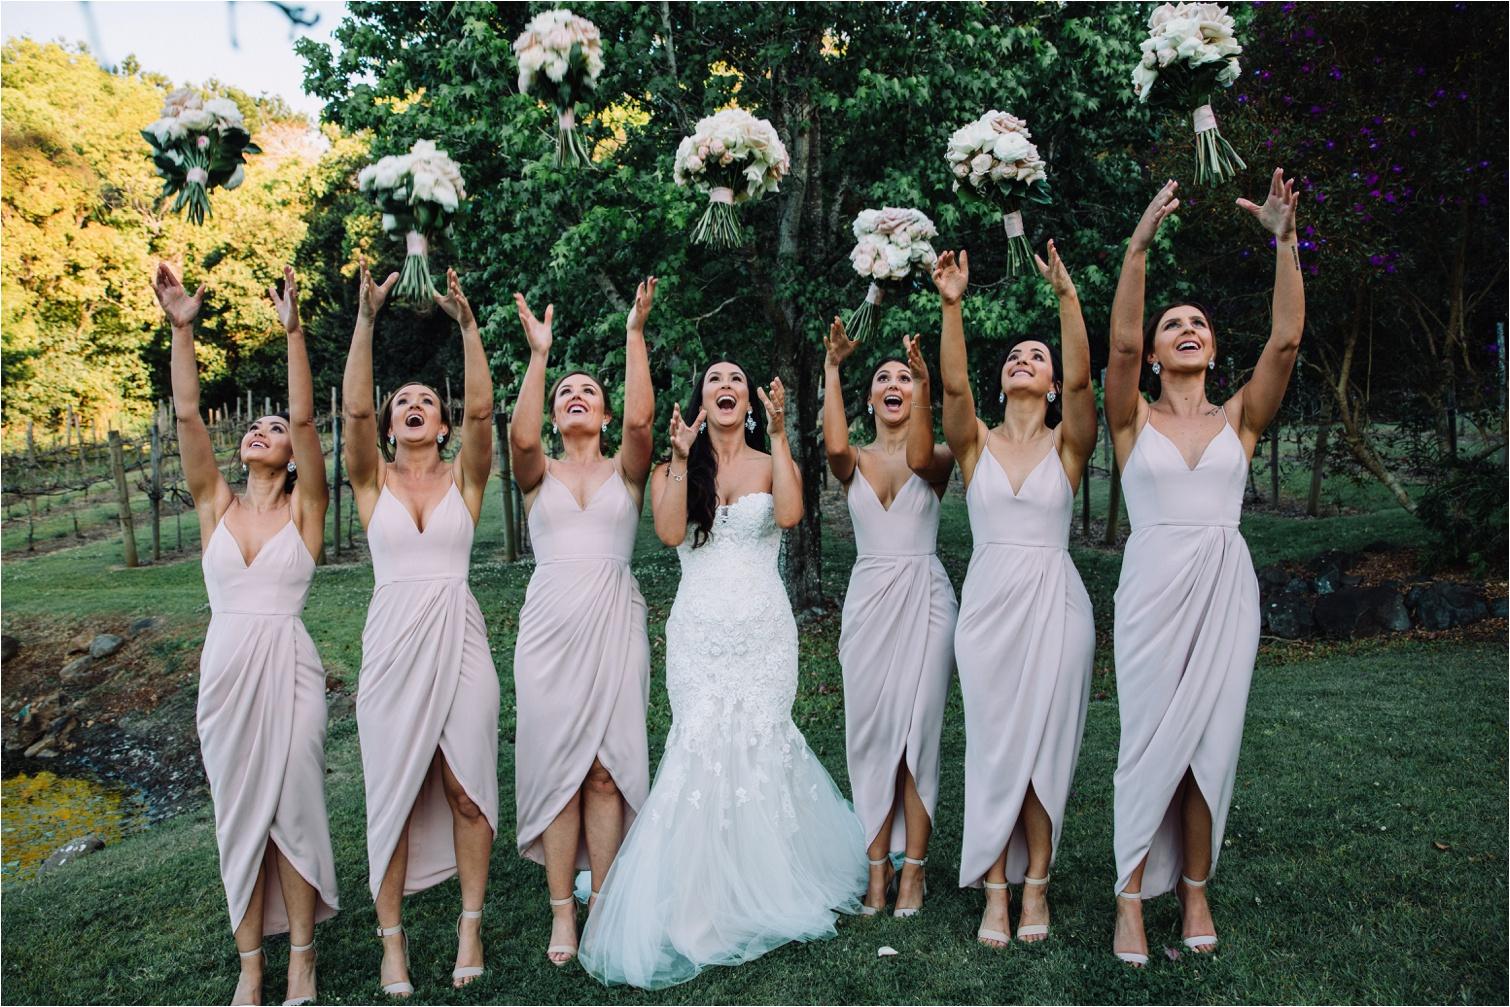 Maleny Manor Wedding Photography - Gold Coast Wedding Photographer_0037.jpg